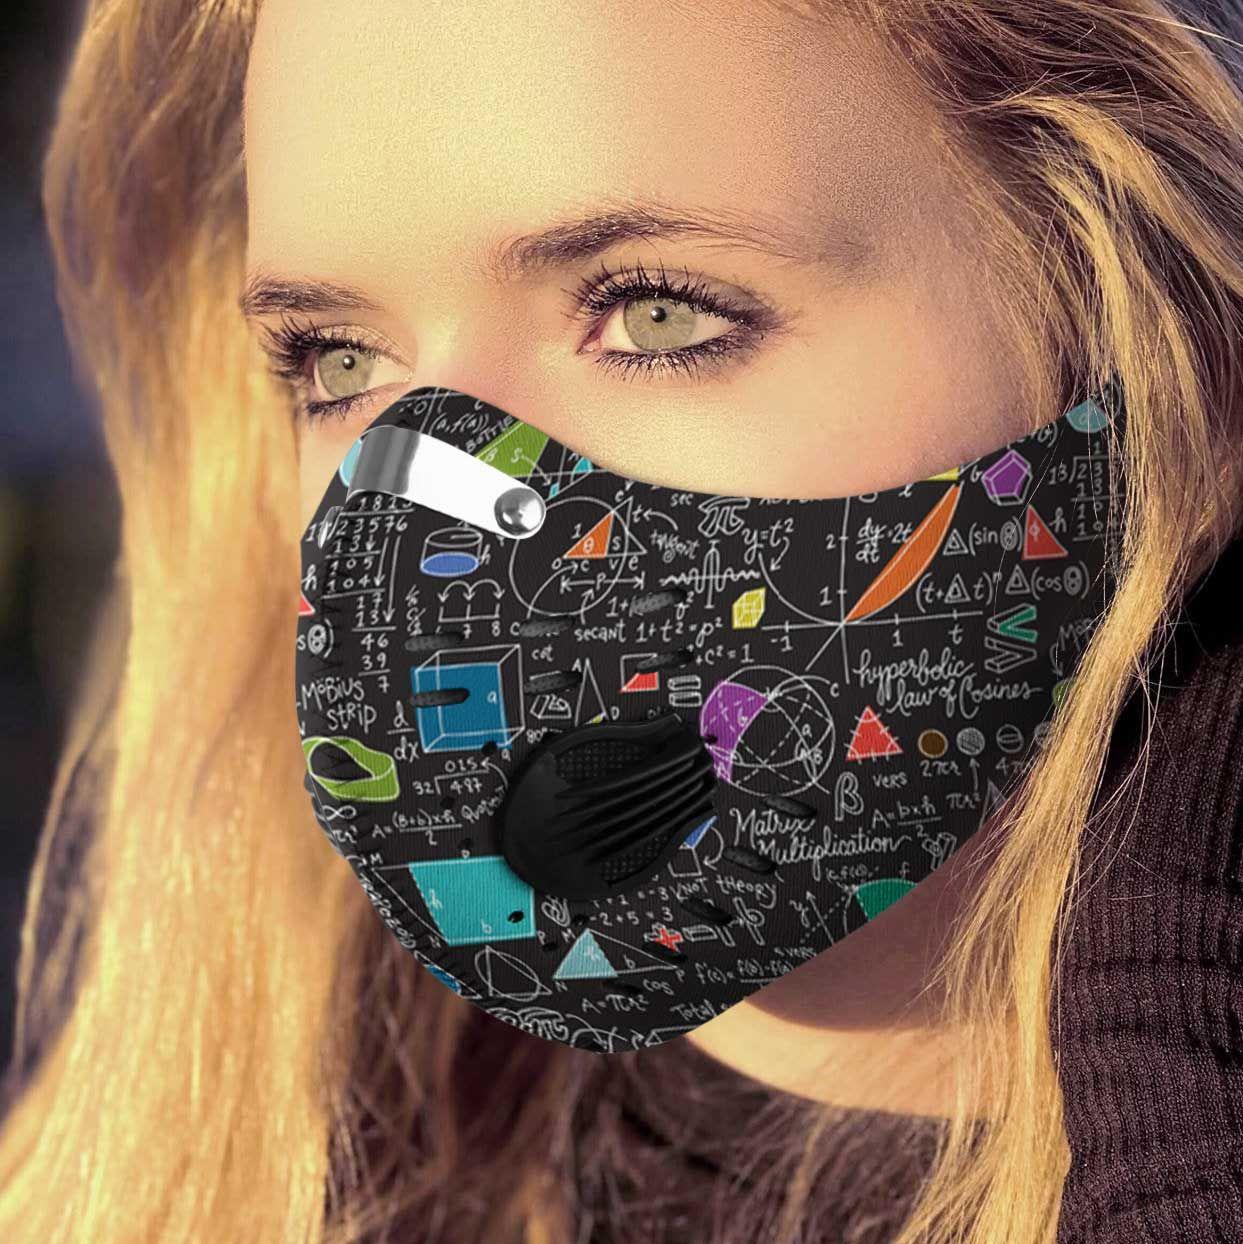 School math board carbon pm 2,5 face mask 3